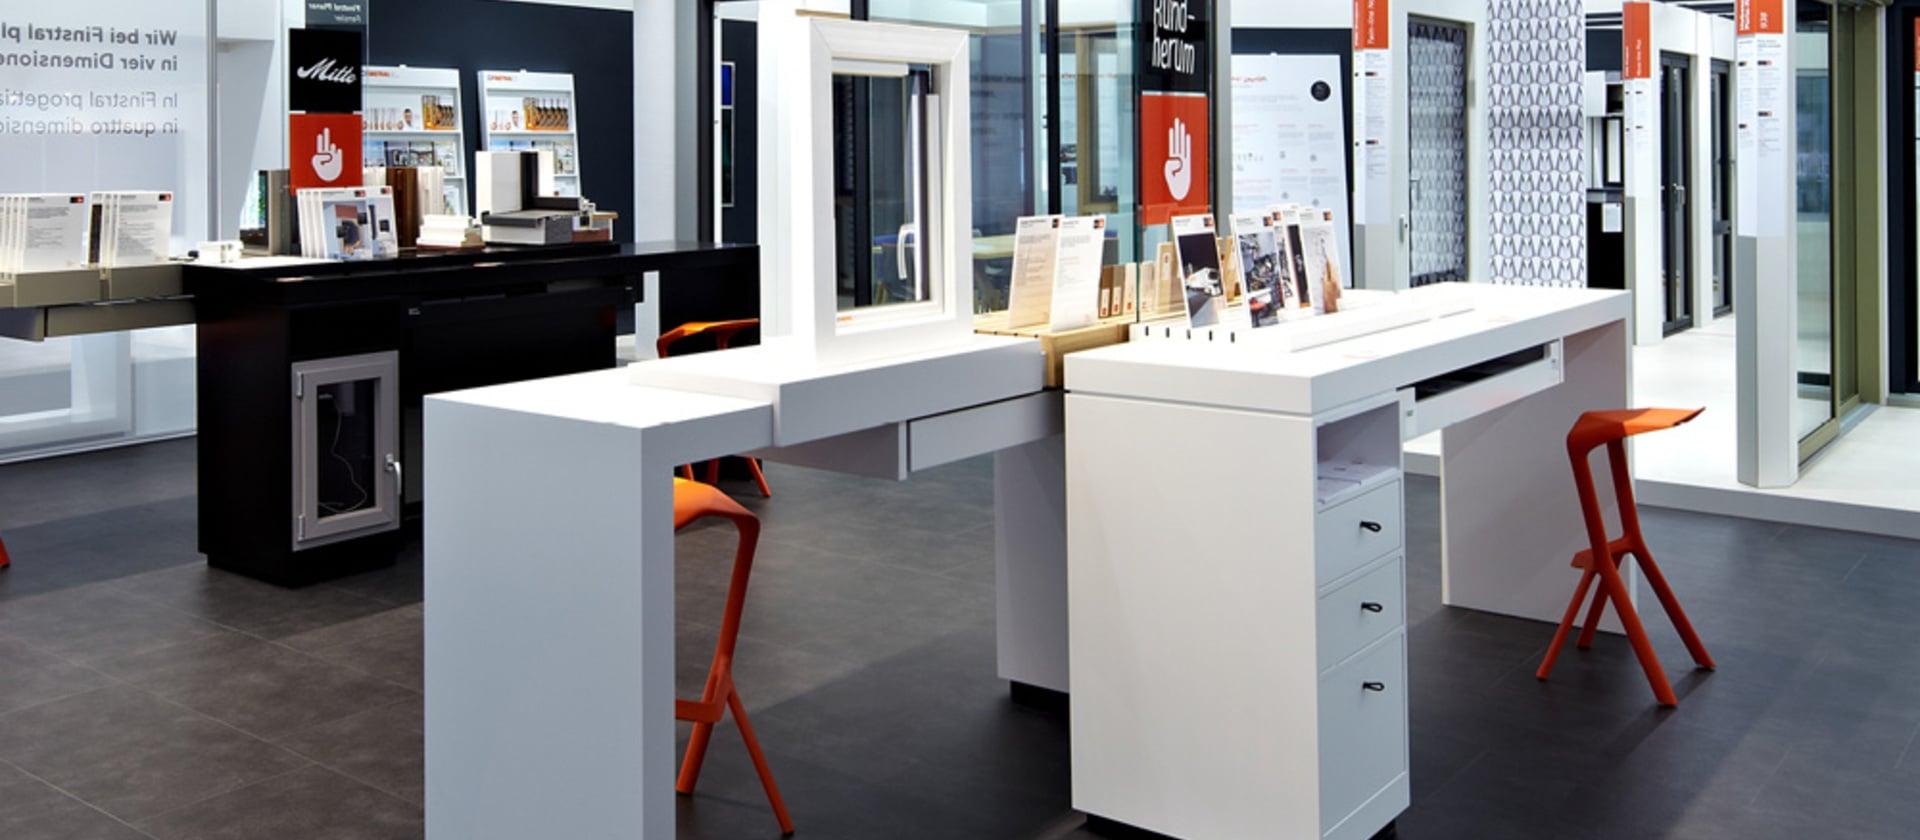 Finstral Studio Unterinn